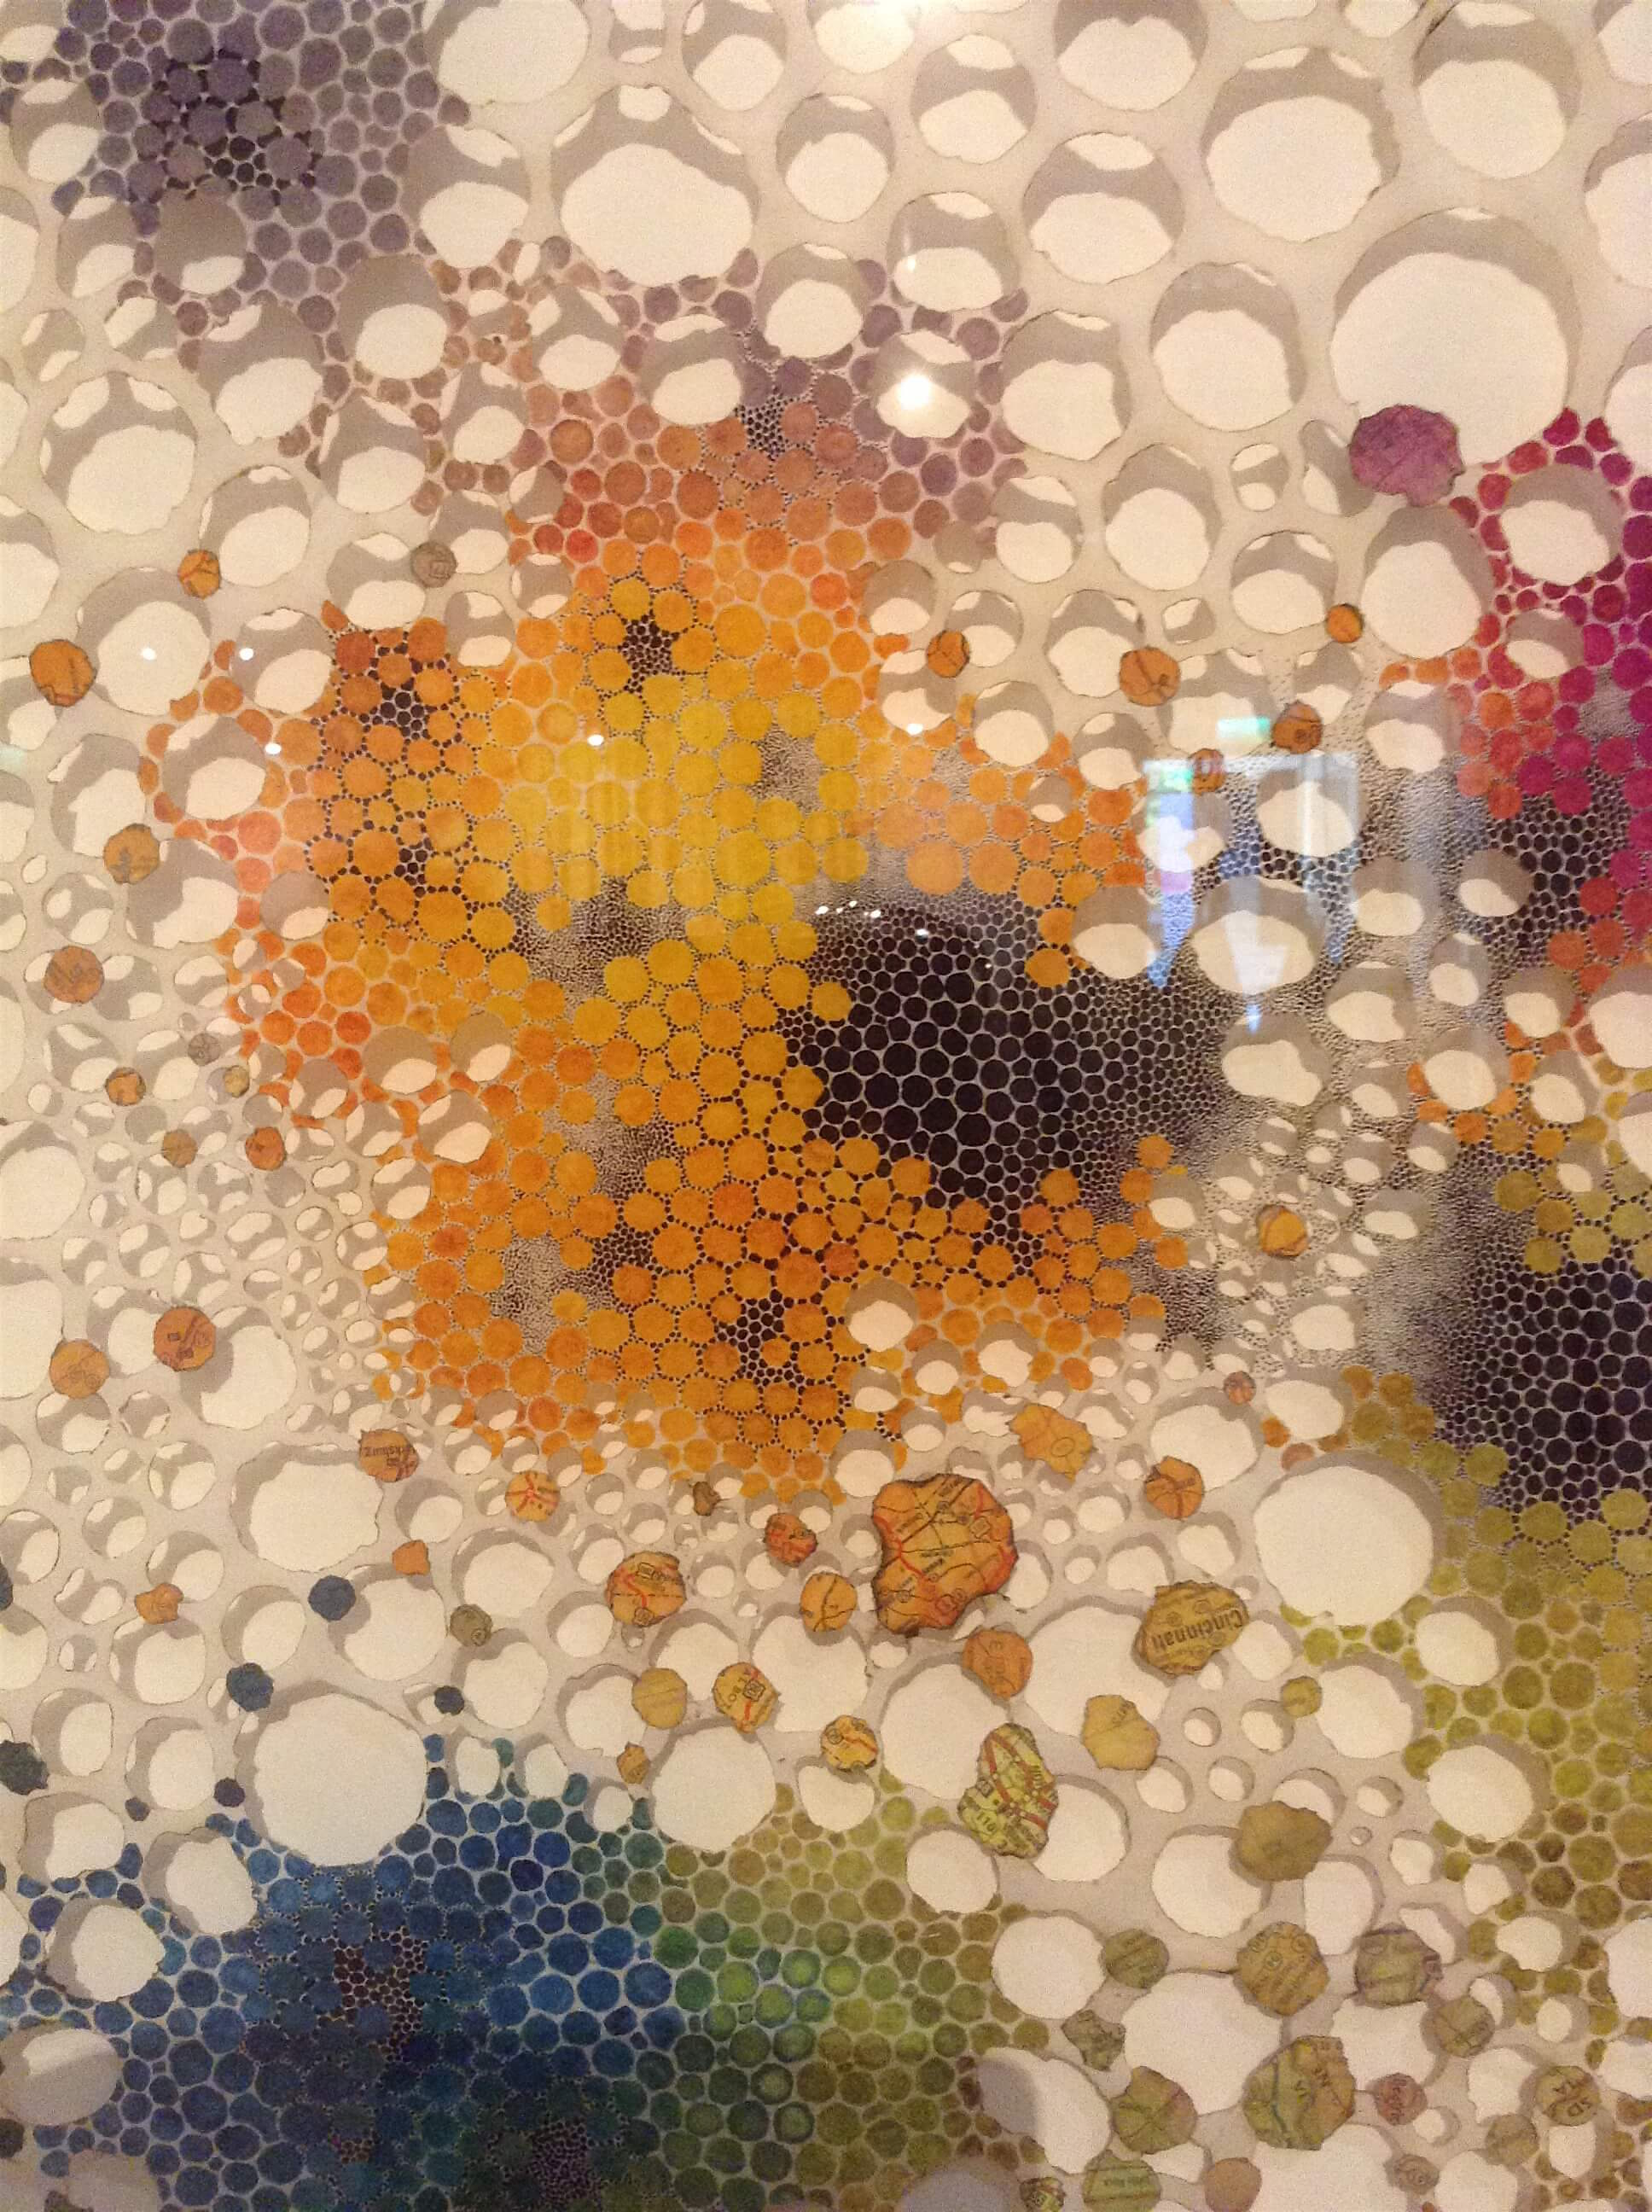 Rijswijk Paper Biennale 2016